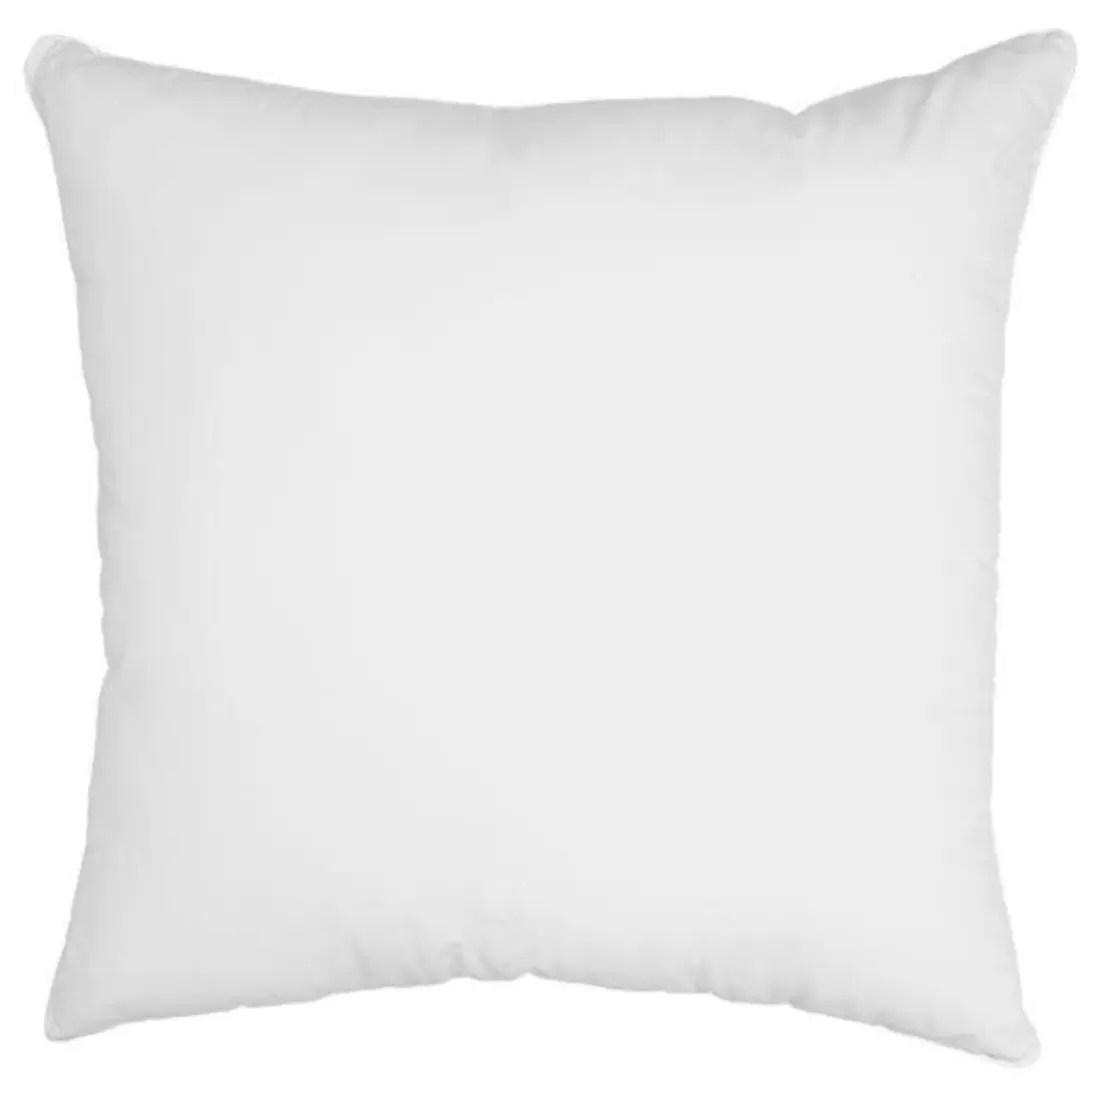 reading pillow target australia